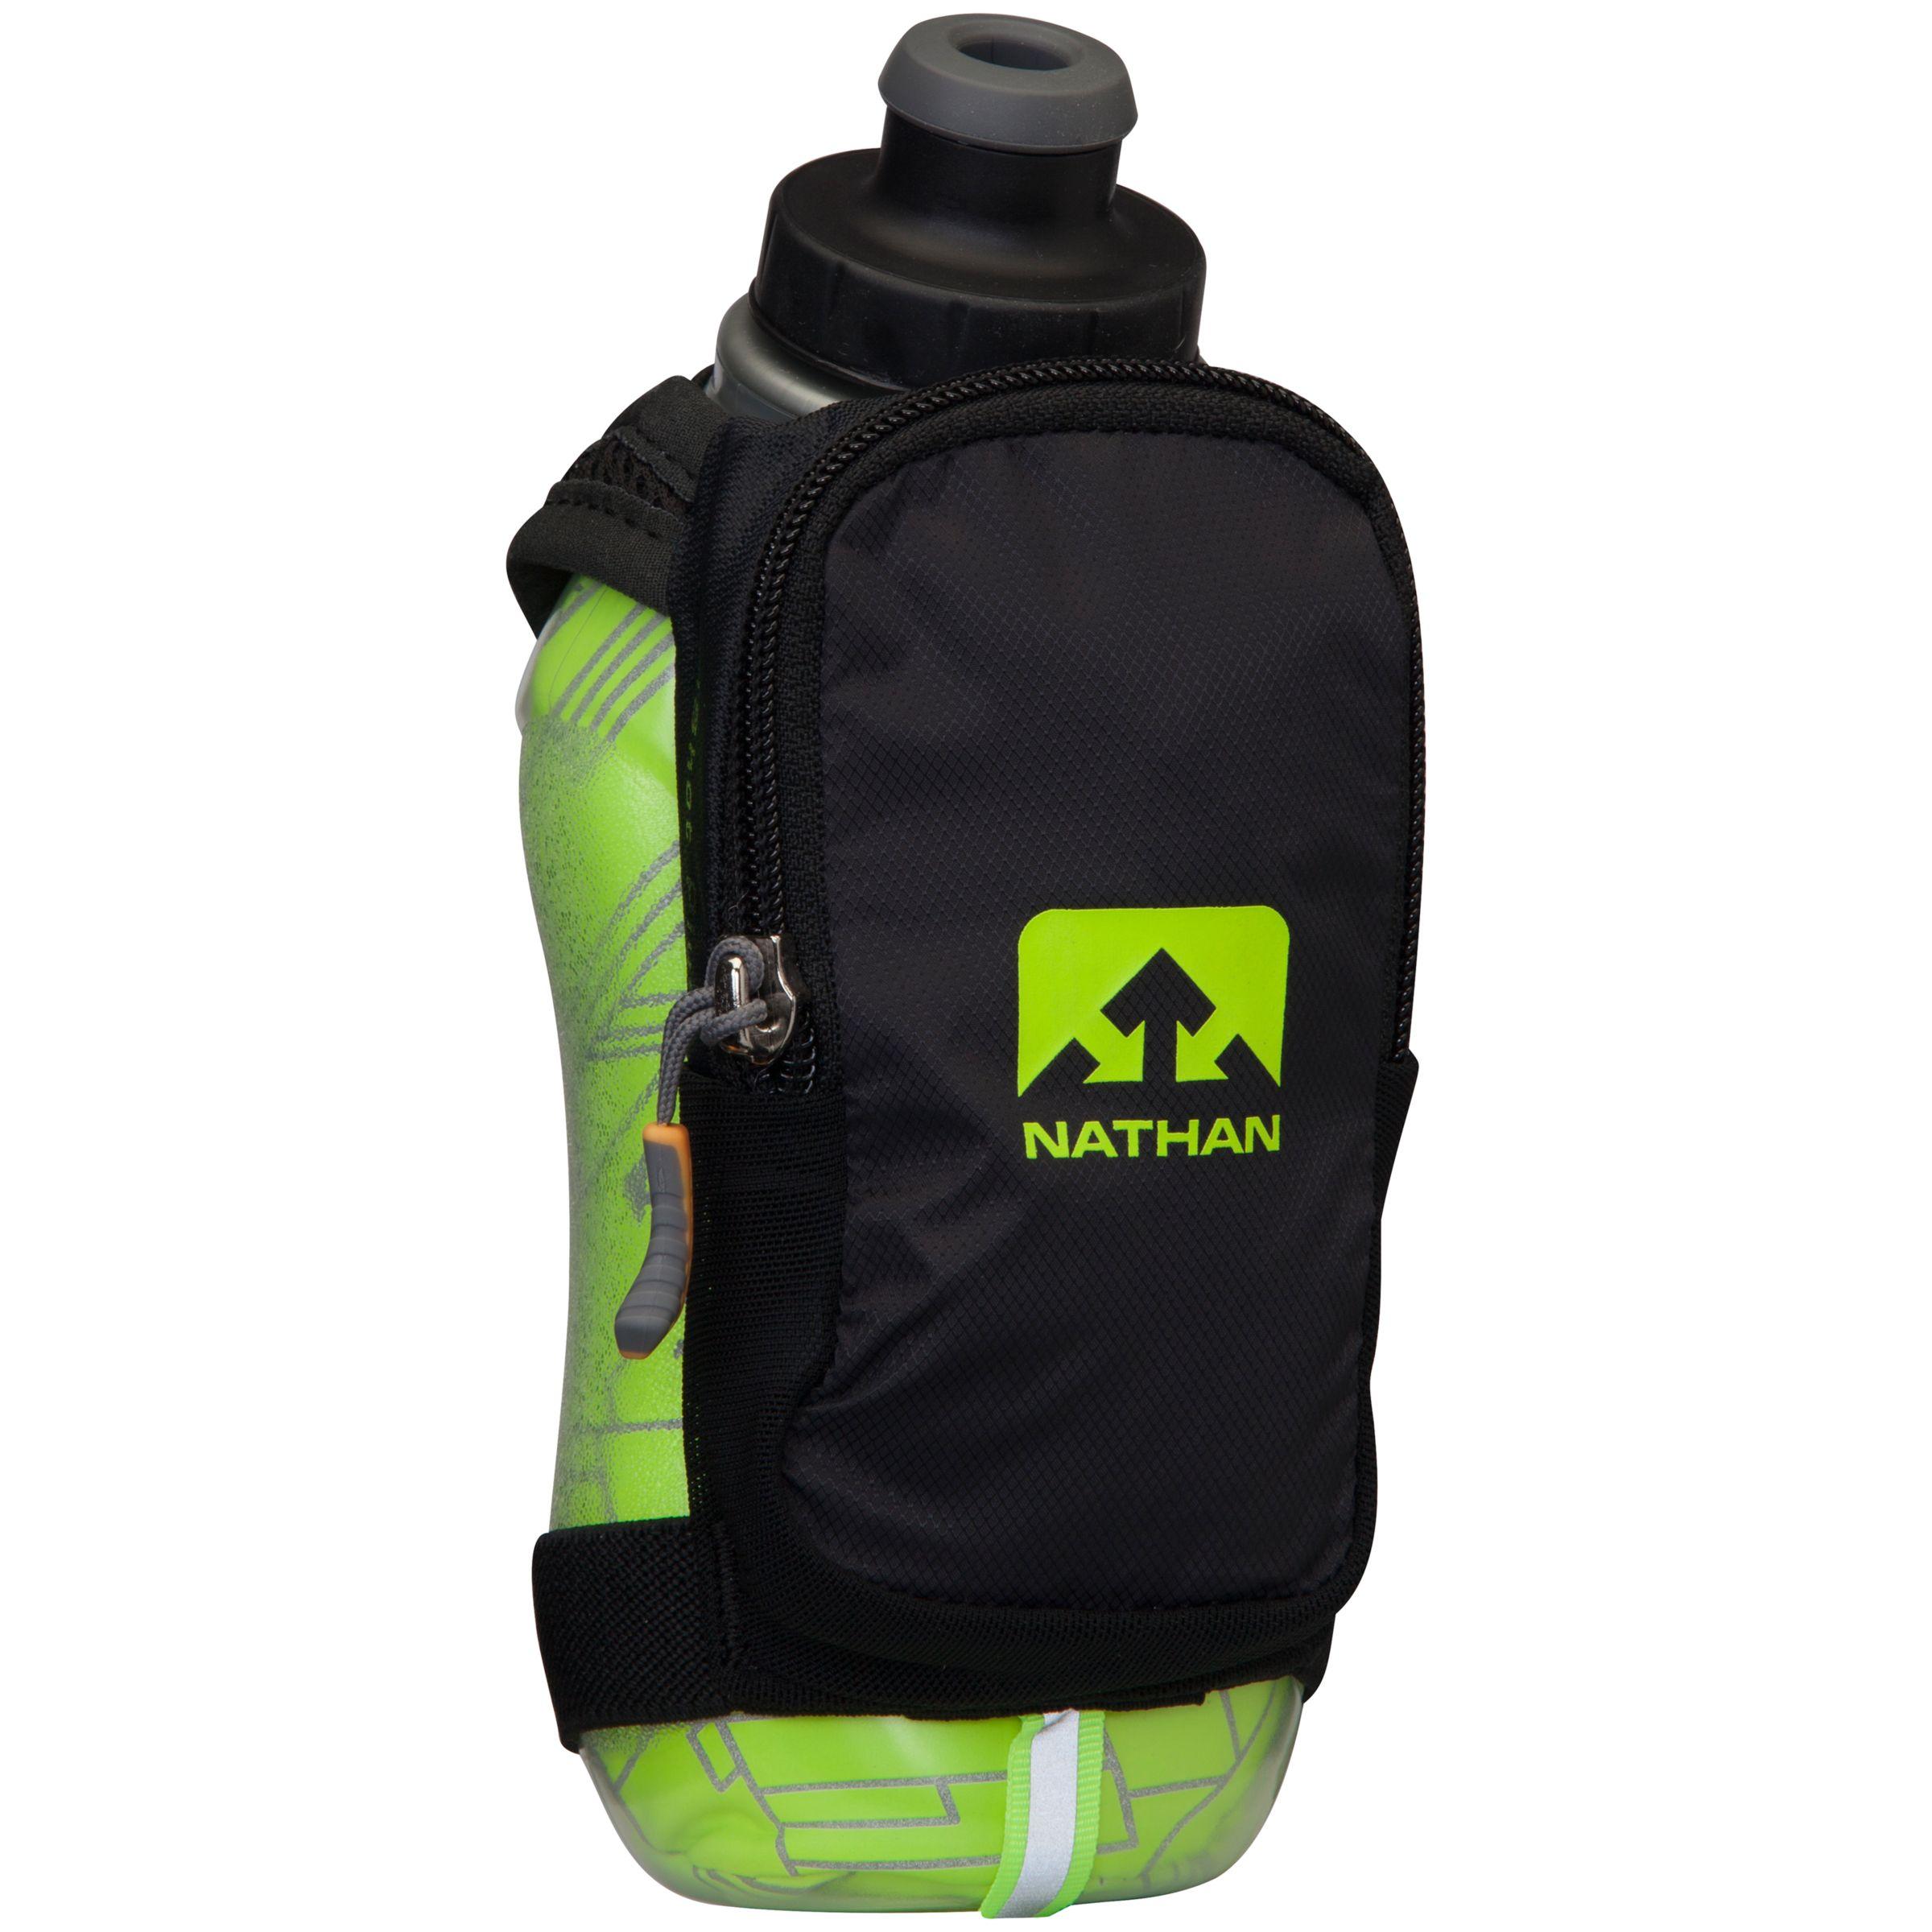 Nathan Nathan SpeedShot Insulated Handheld Flask, 335ml